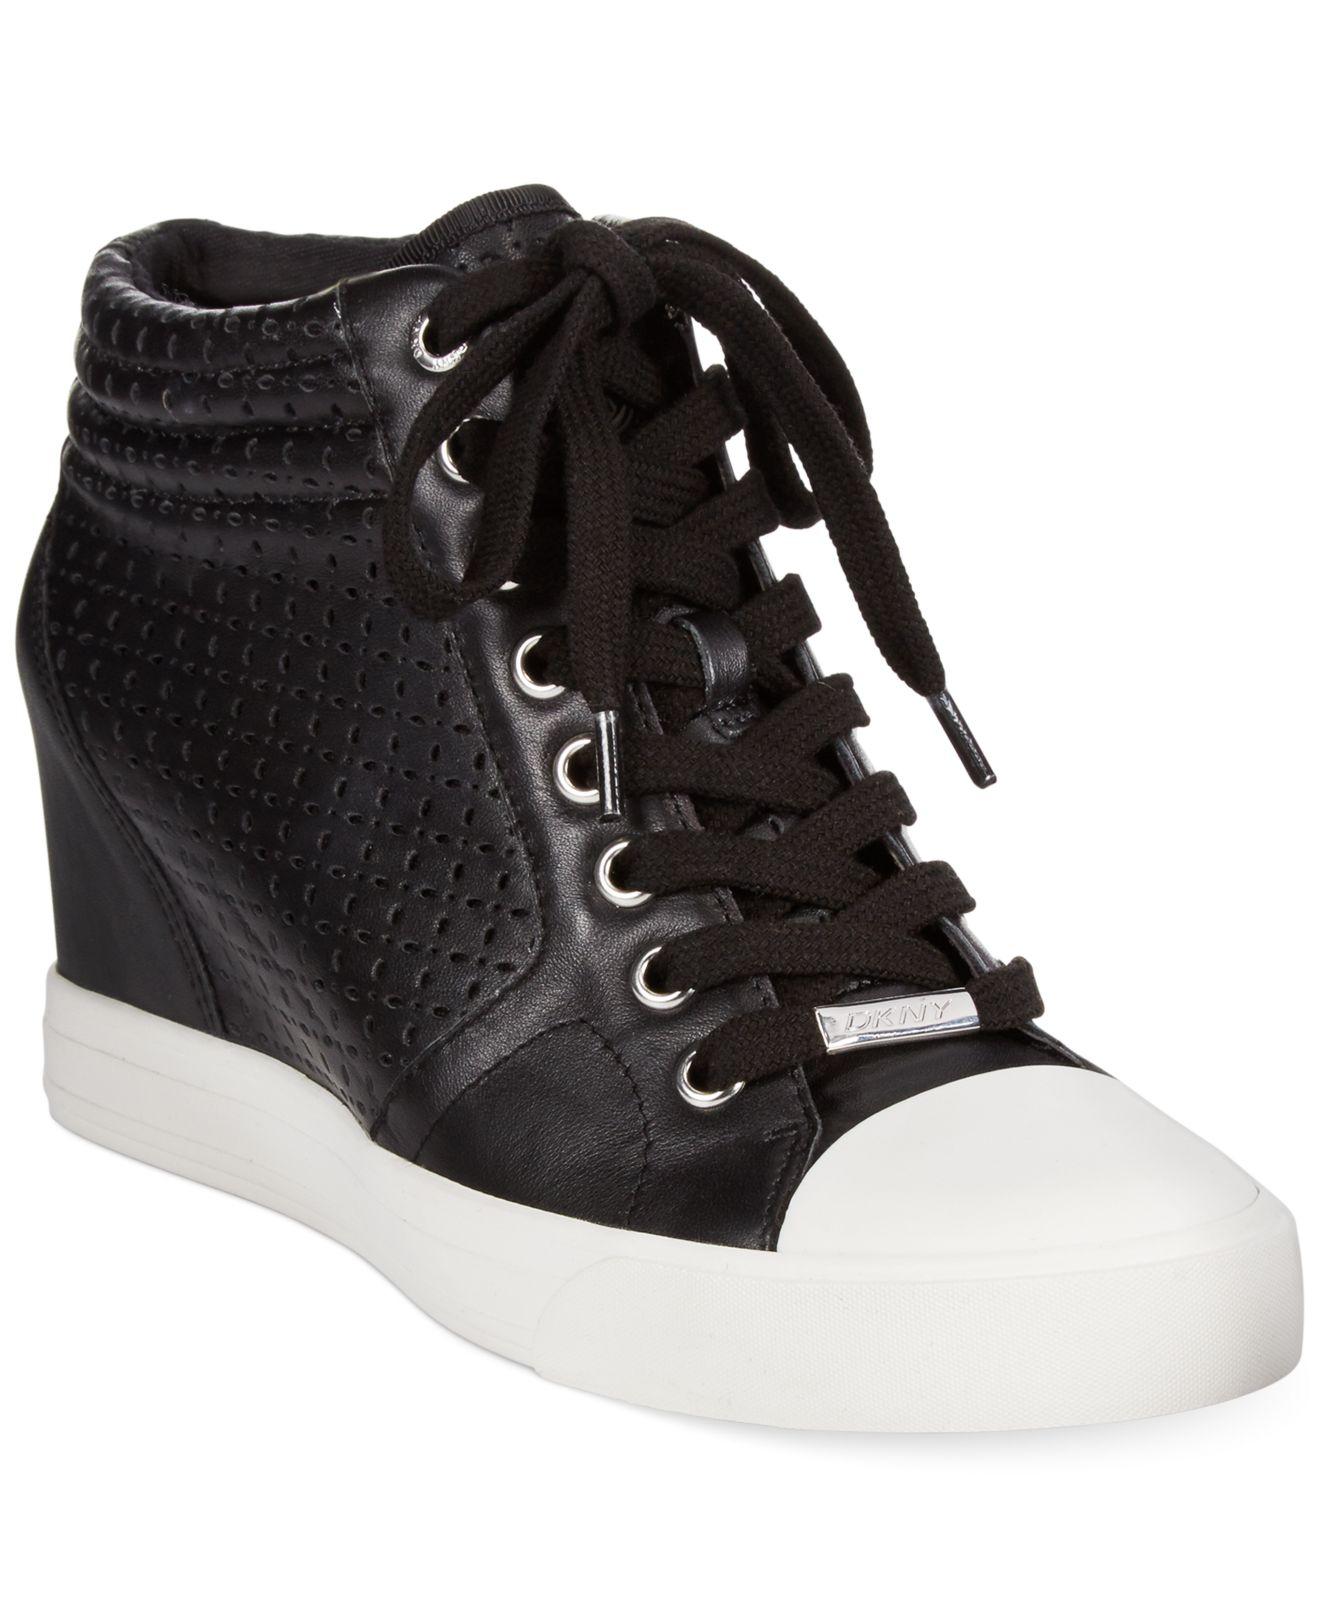 1adb016a5399 Lyst - DKNY Cindy Wedge Sneakers in Black